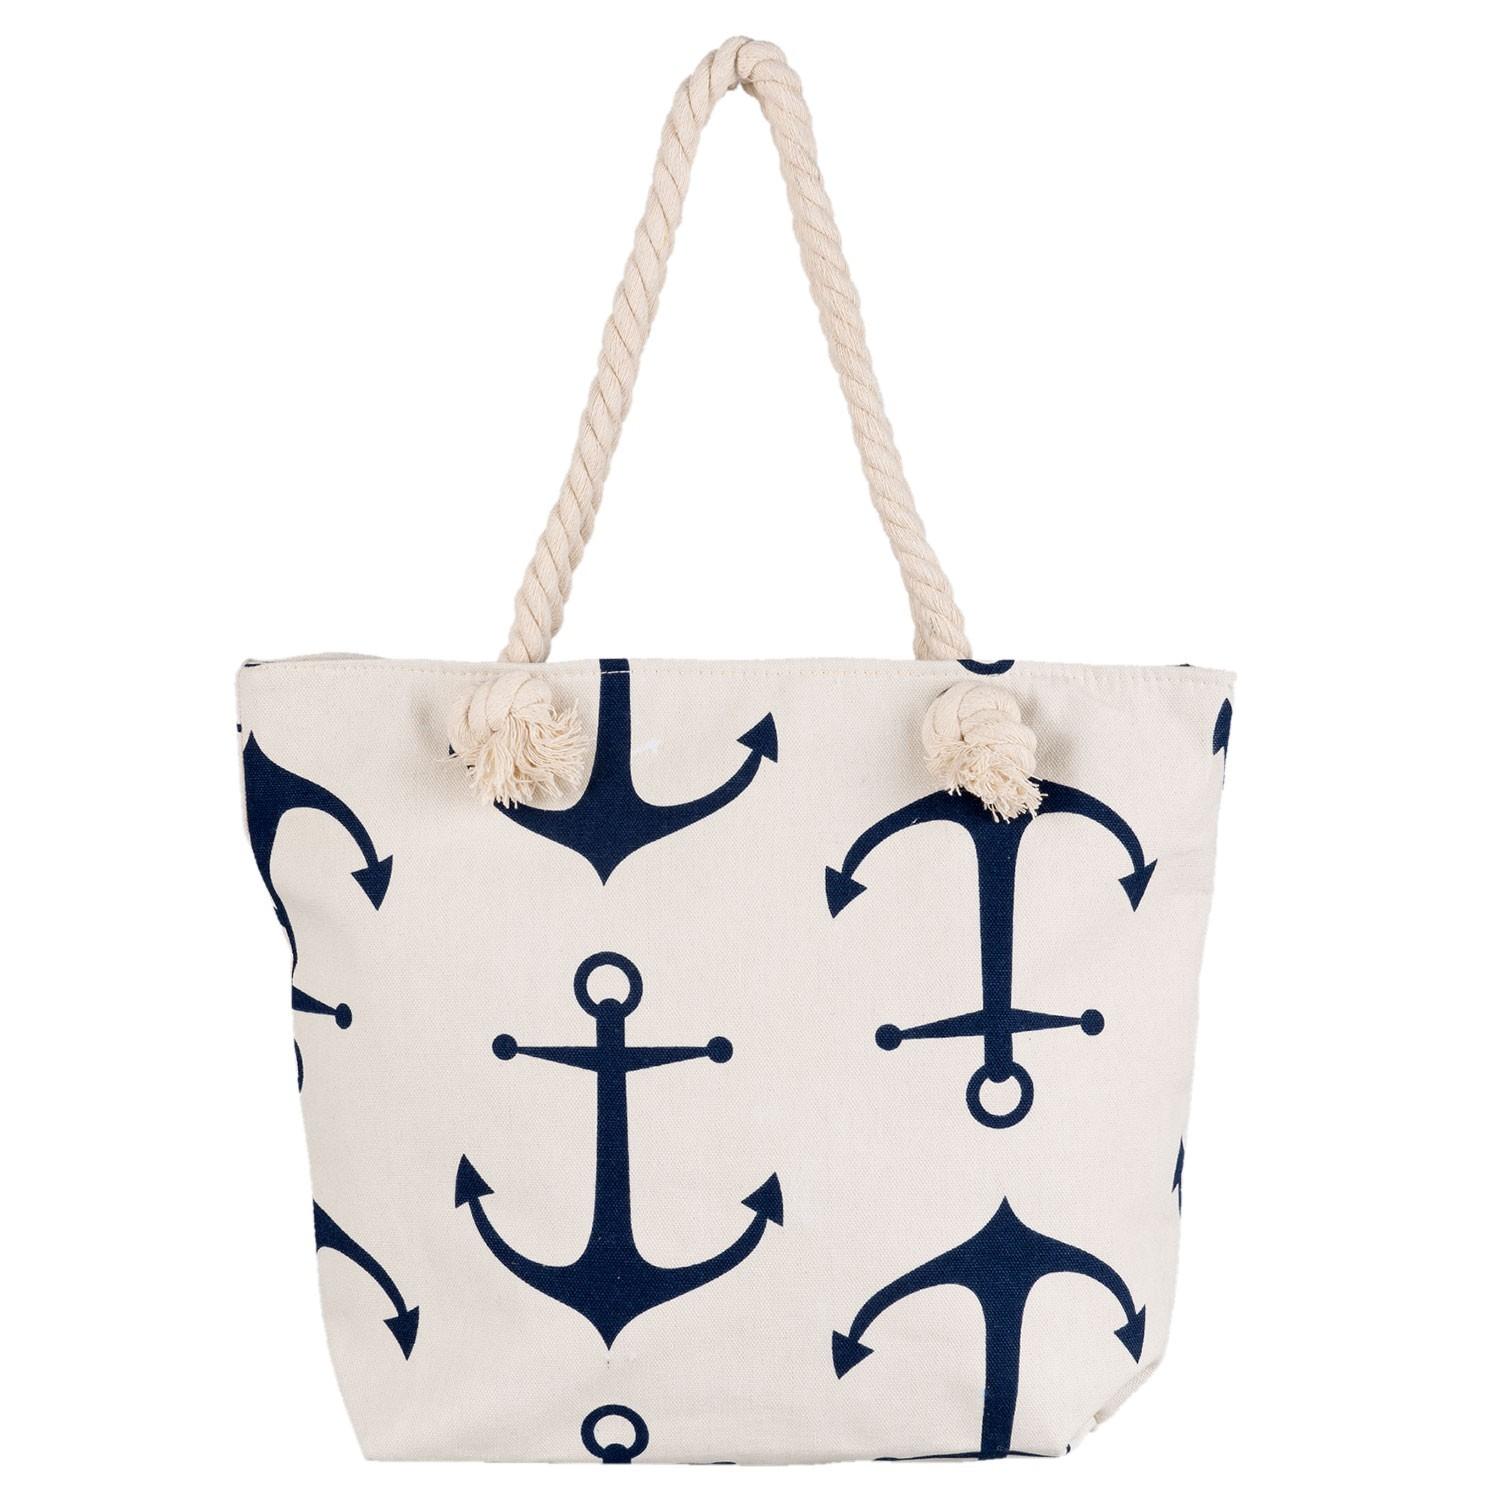 3116dad77b Nákupní plážová taška Nautical - 45 35 cm